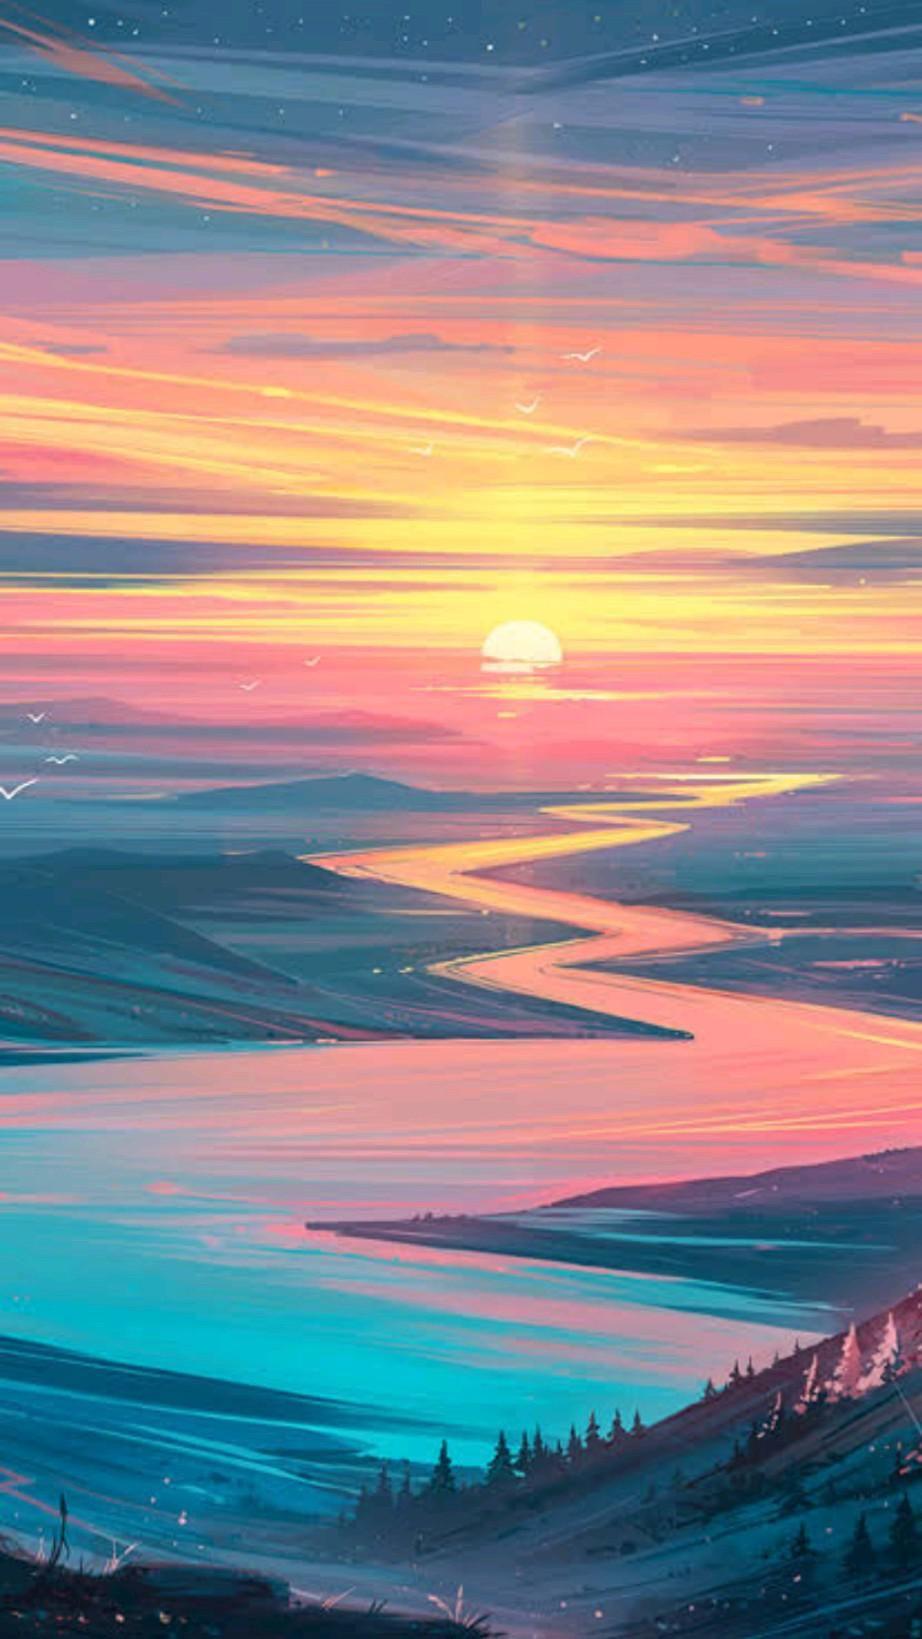 landscape aesthetic